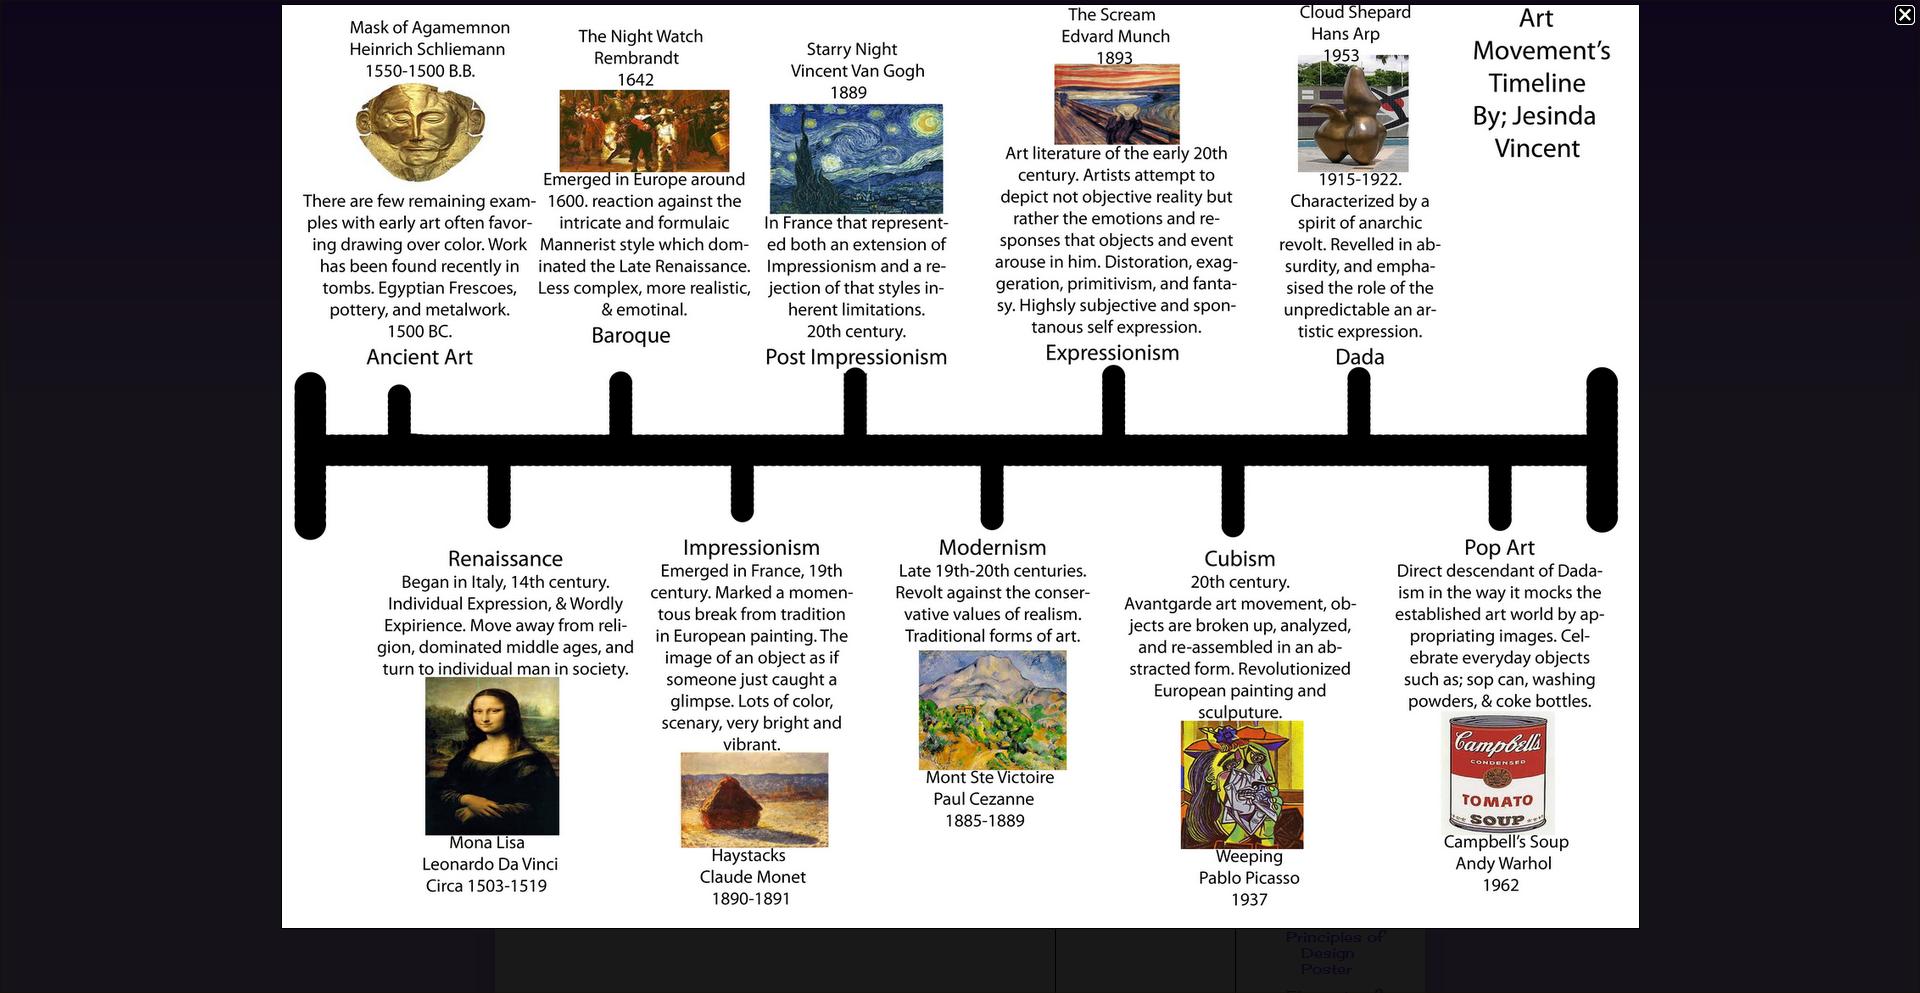 Jesinda S Blog Art Movement Timeline Art